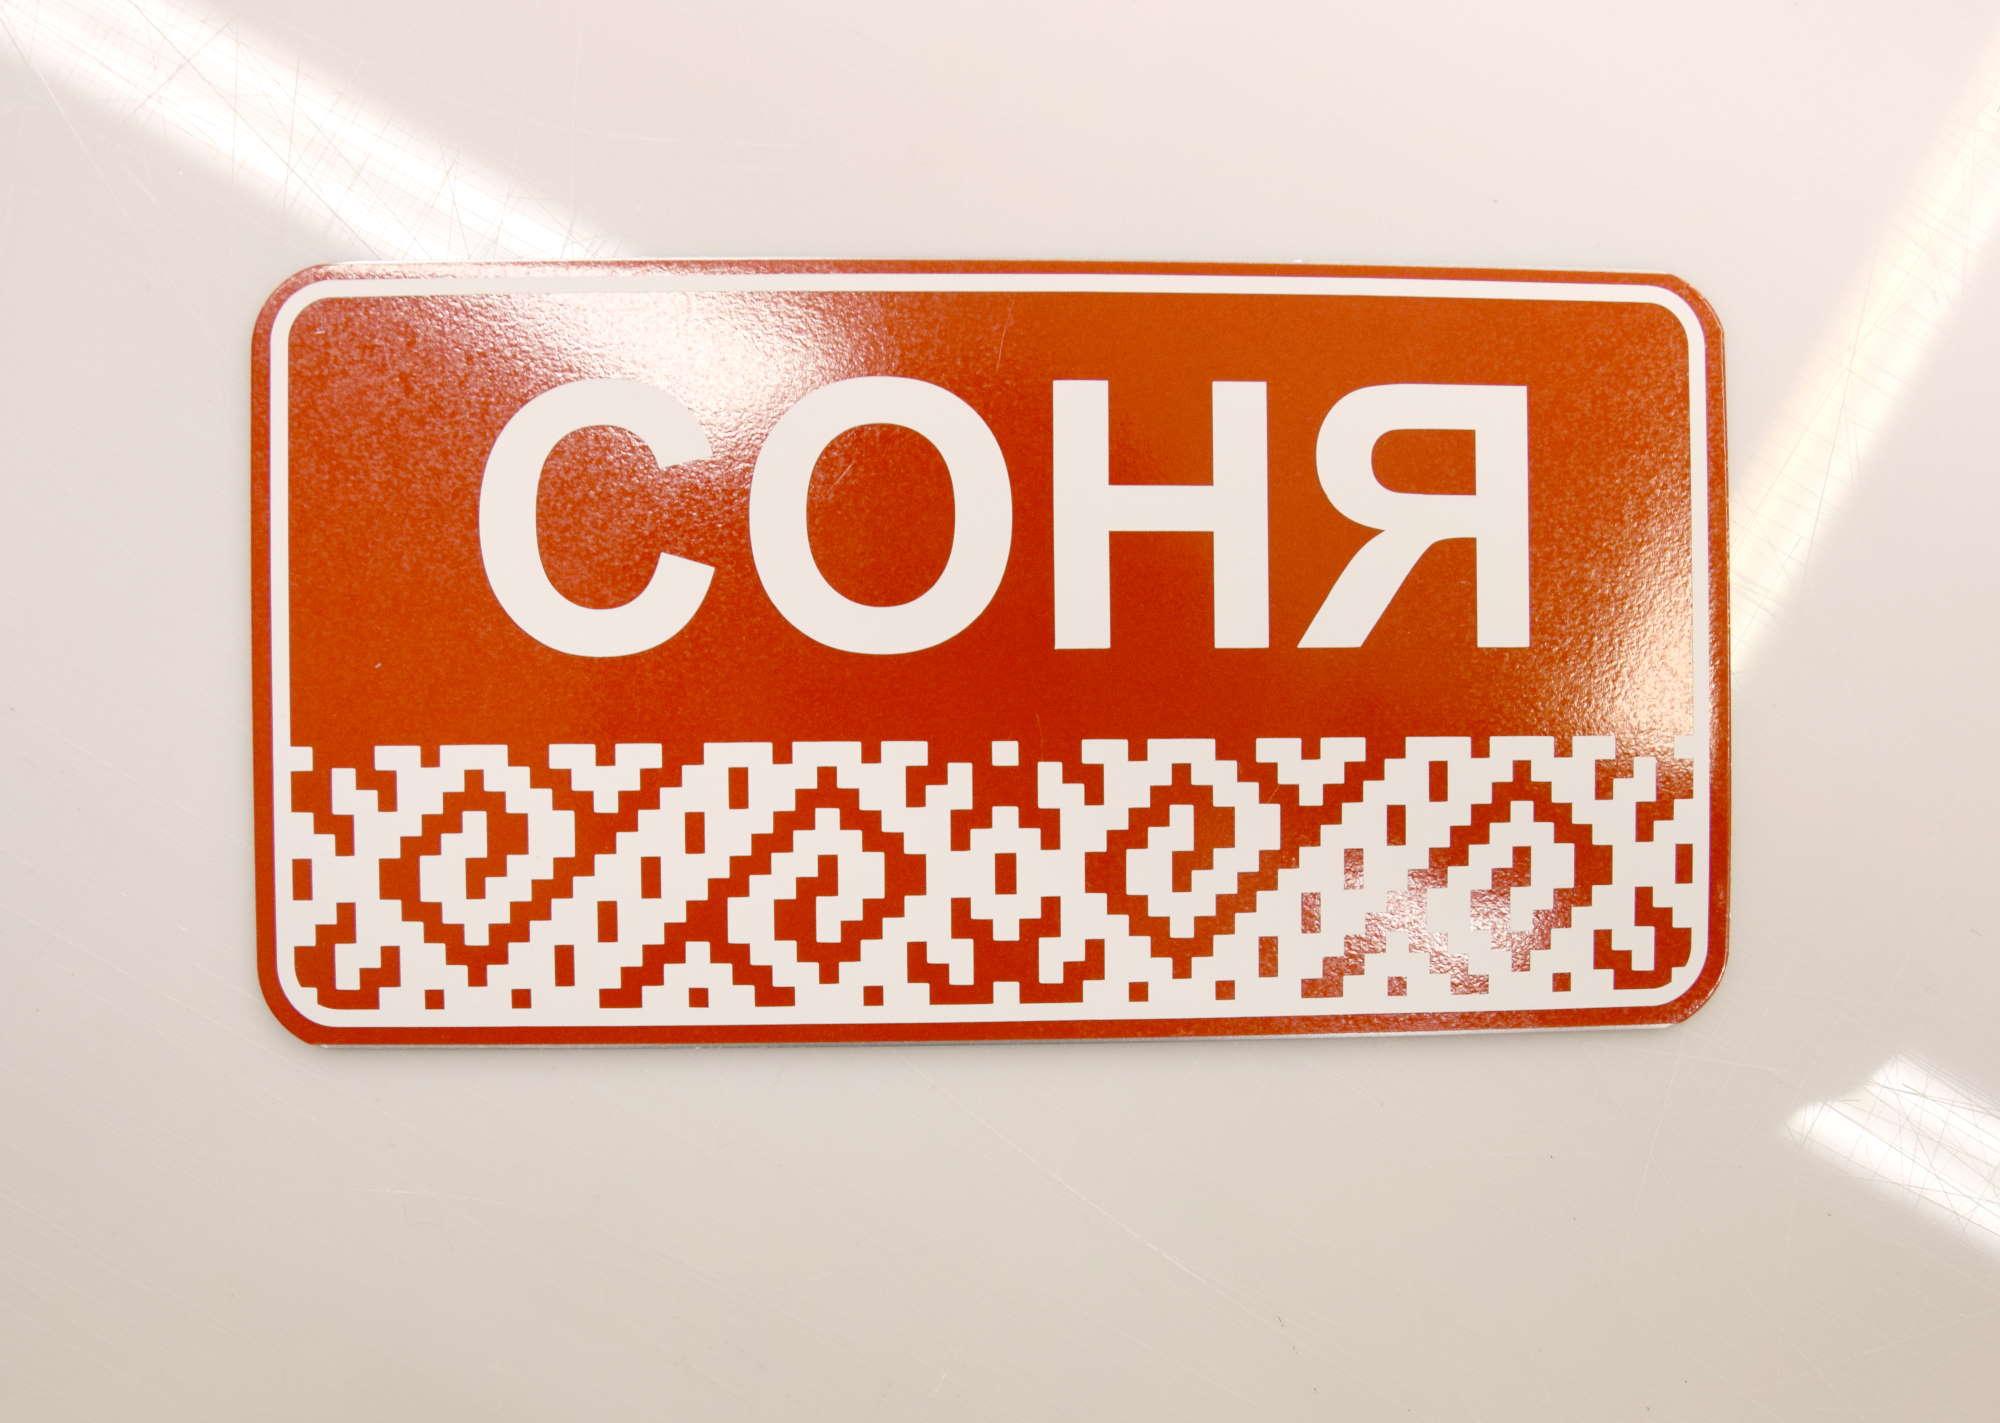 LATSIGN Именная табличка для тележки с латишками орнаментами - Соня